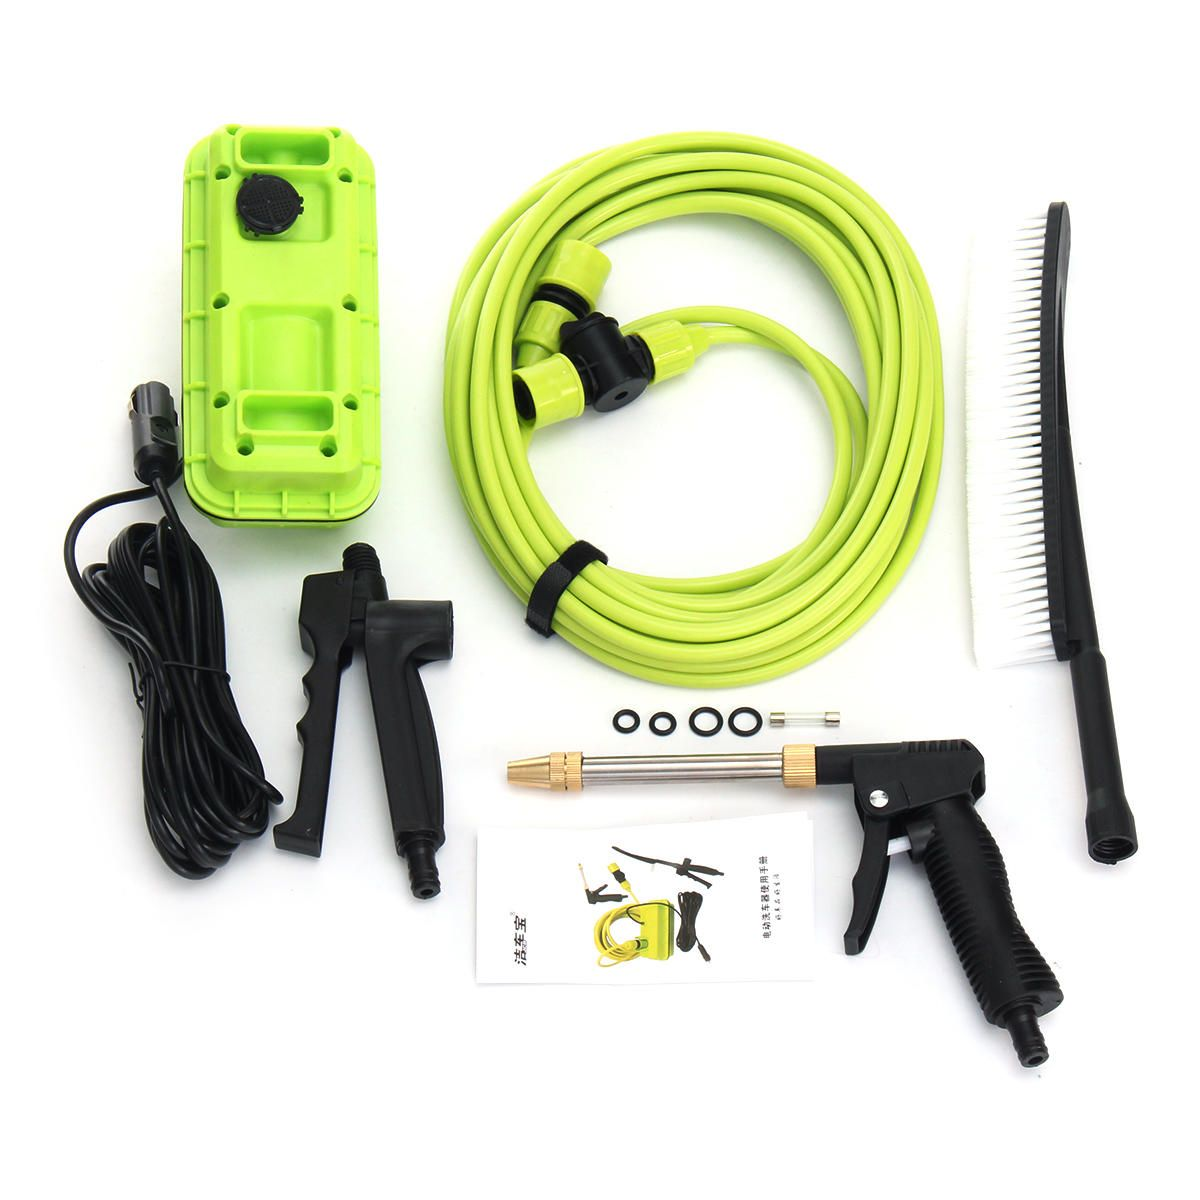 JJE US$137.20 12V 80W Portable High Pressure Washer Spray Gun Electric Car Washer Cleaner Pump